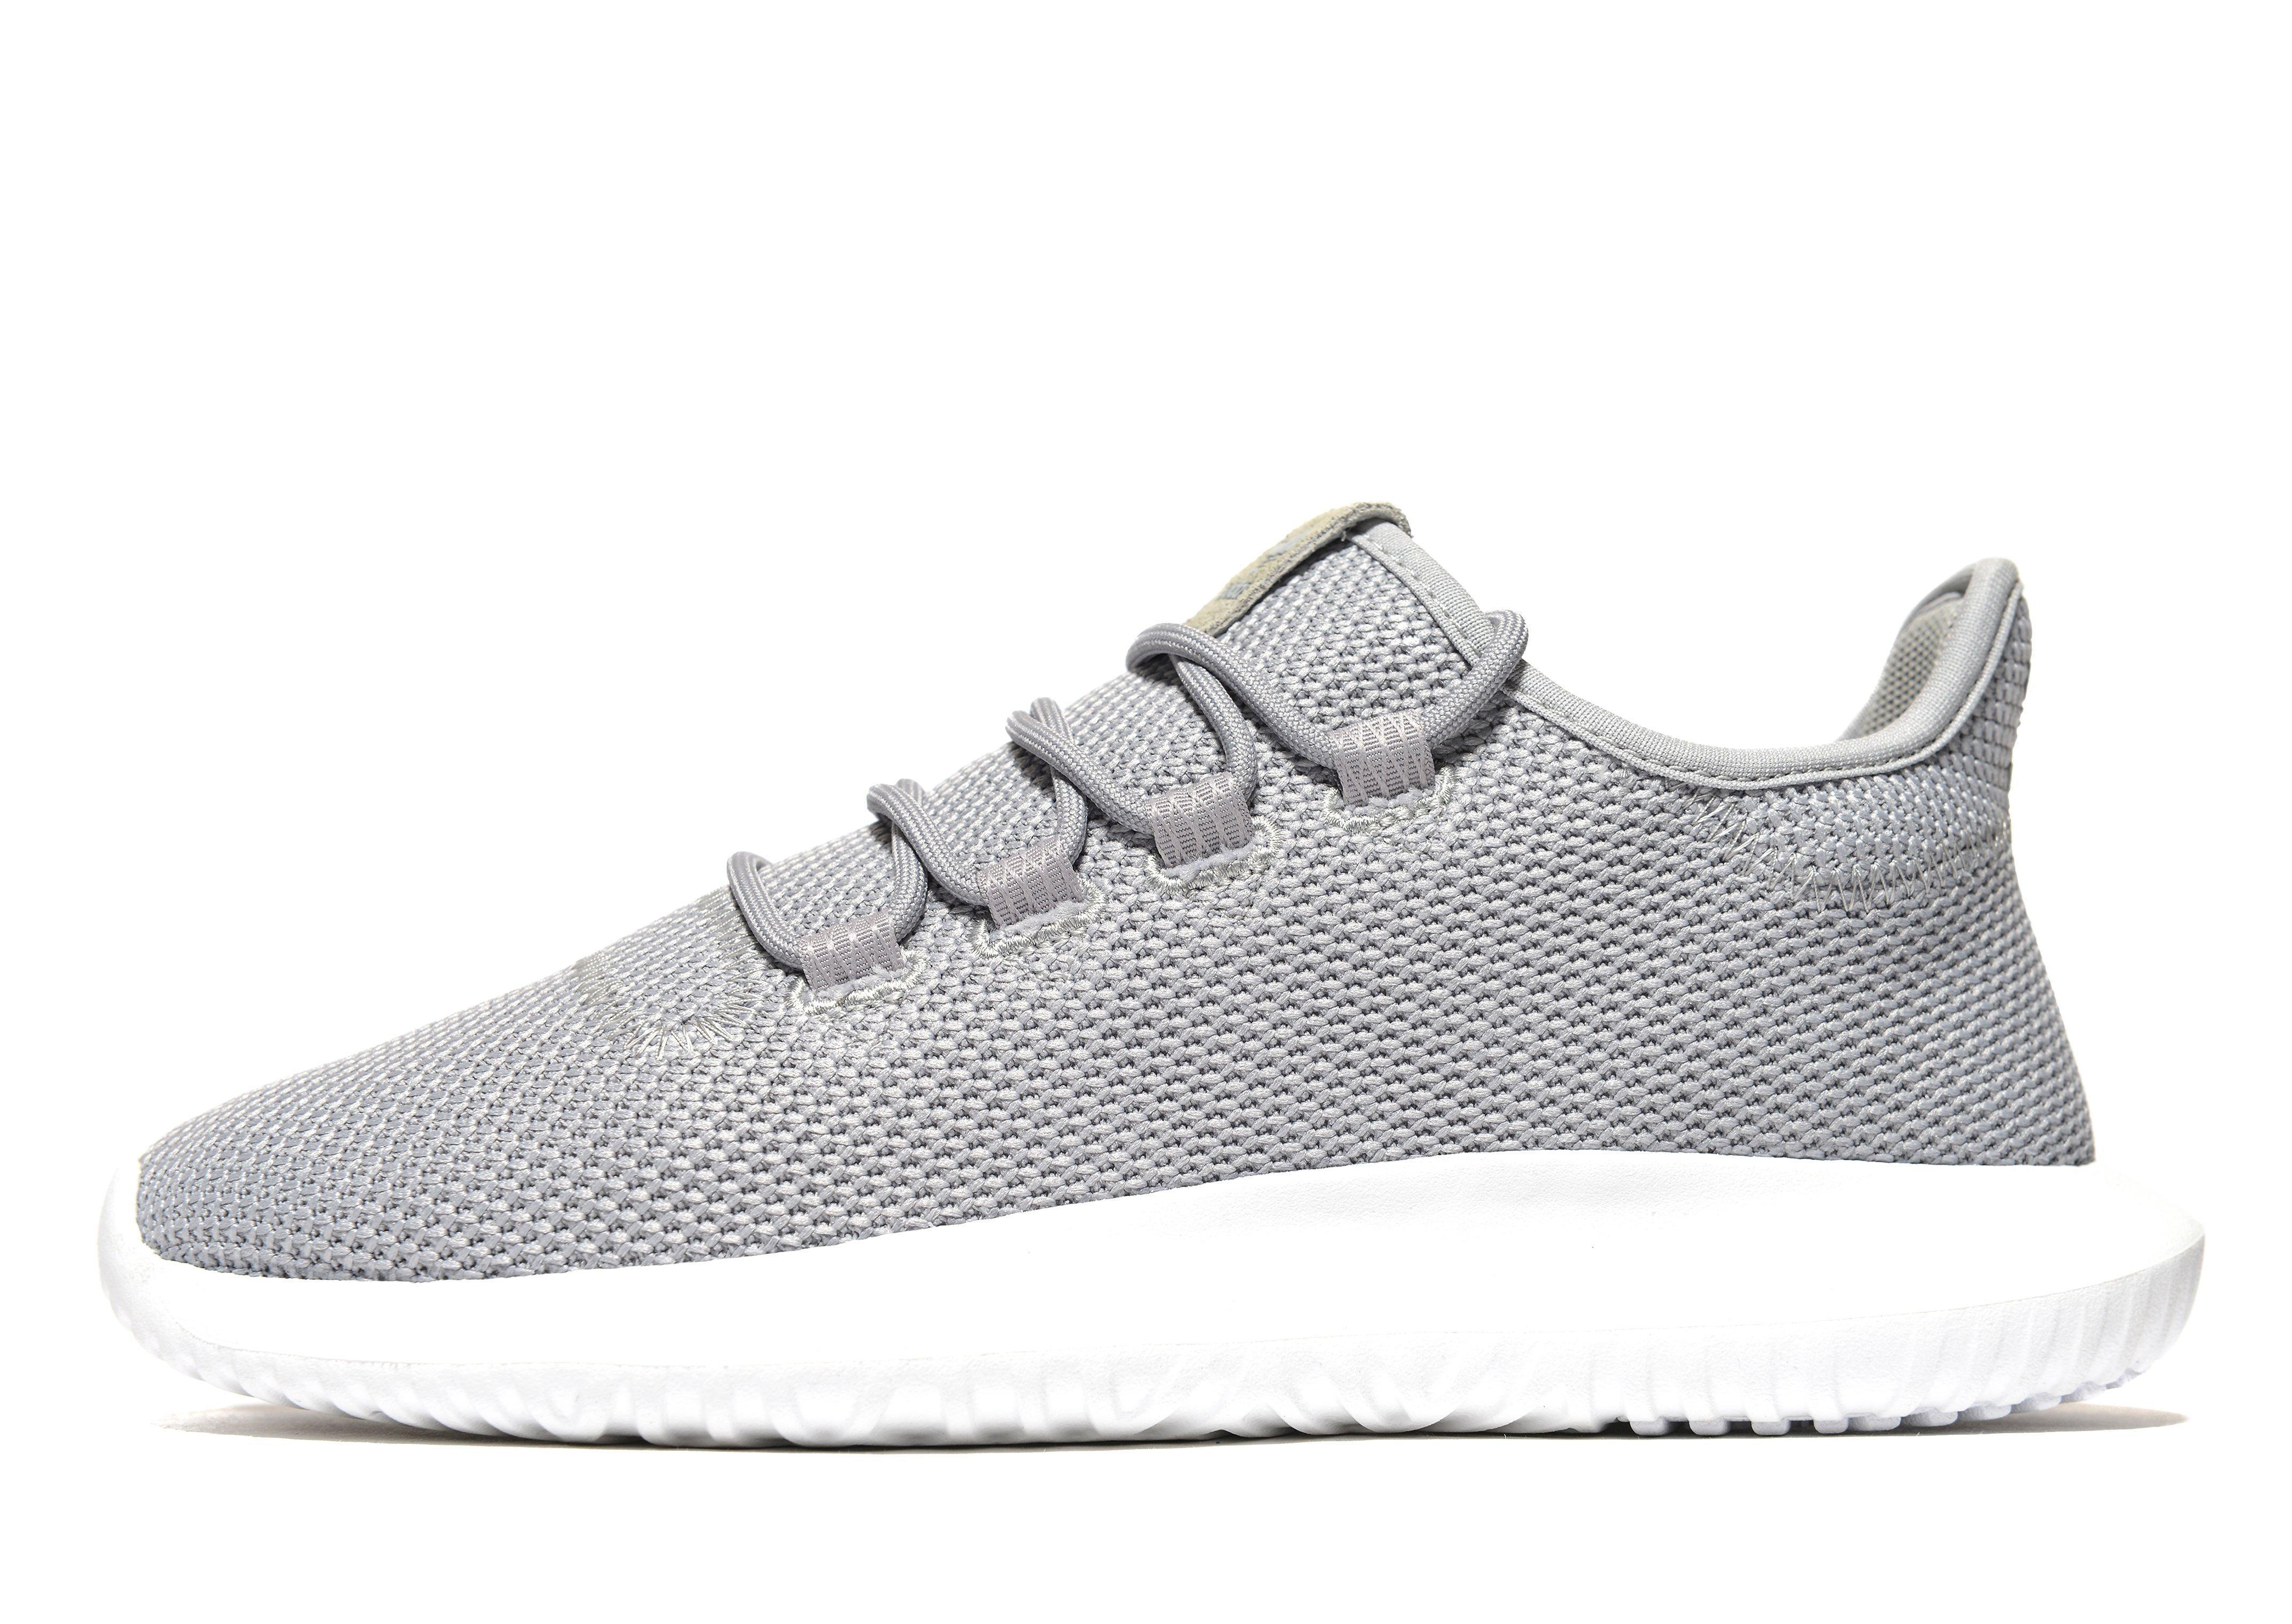 Adidas Running Shoes Jd Sports